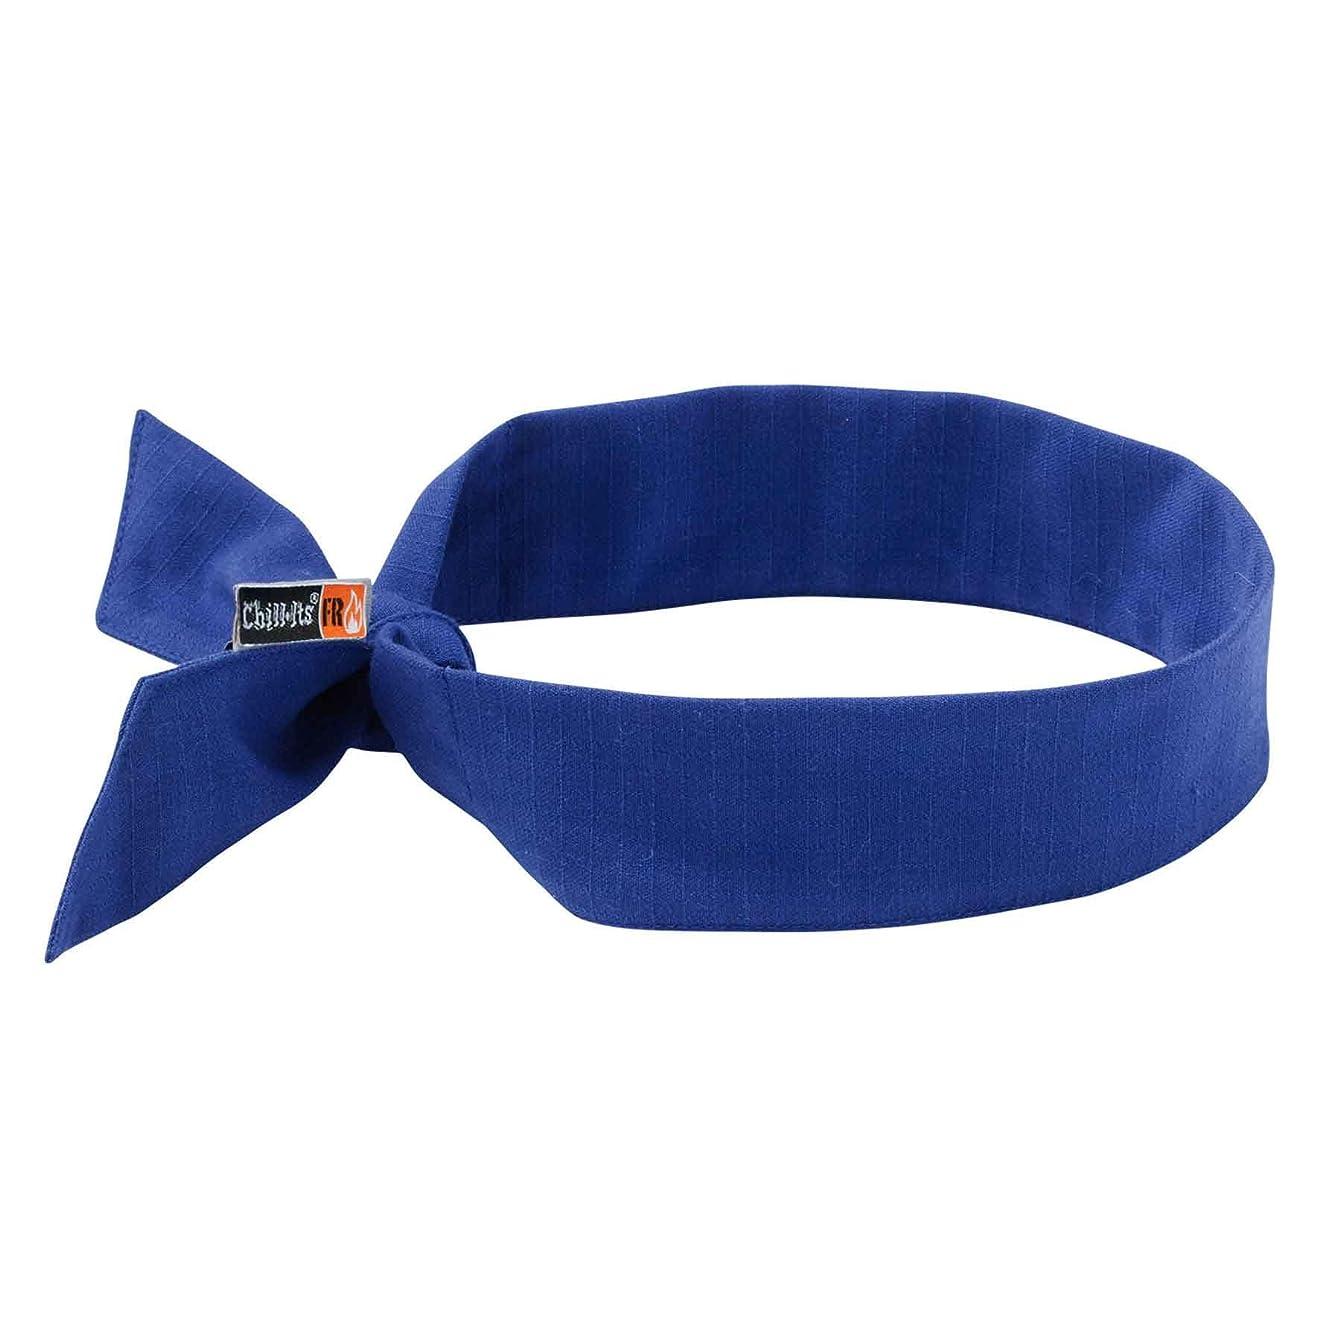 Cooling Bandana, Fire Resistant, Evaporative Polymer Crystals for Cooling Relief, Tie for Adjustable Fit, Ergodyne 6700FR